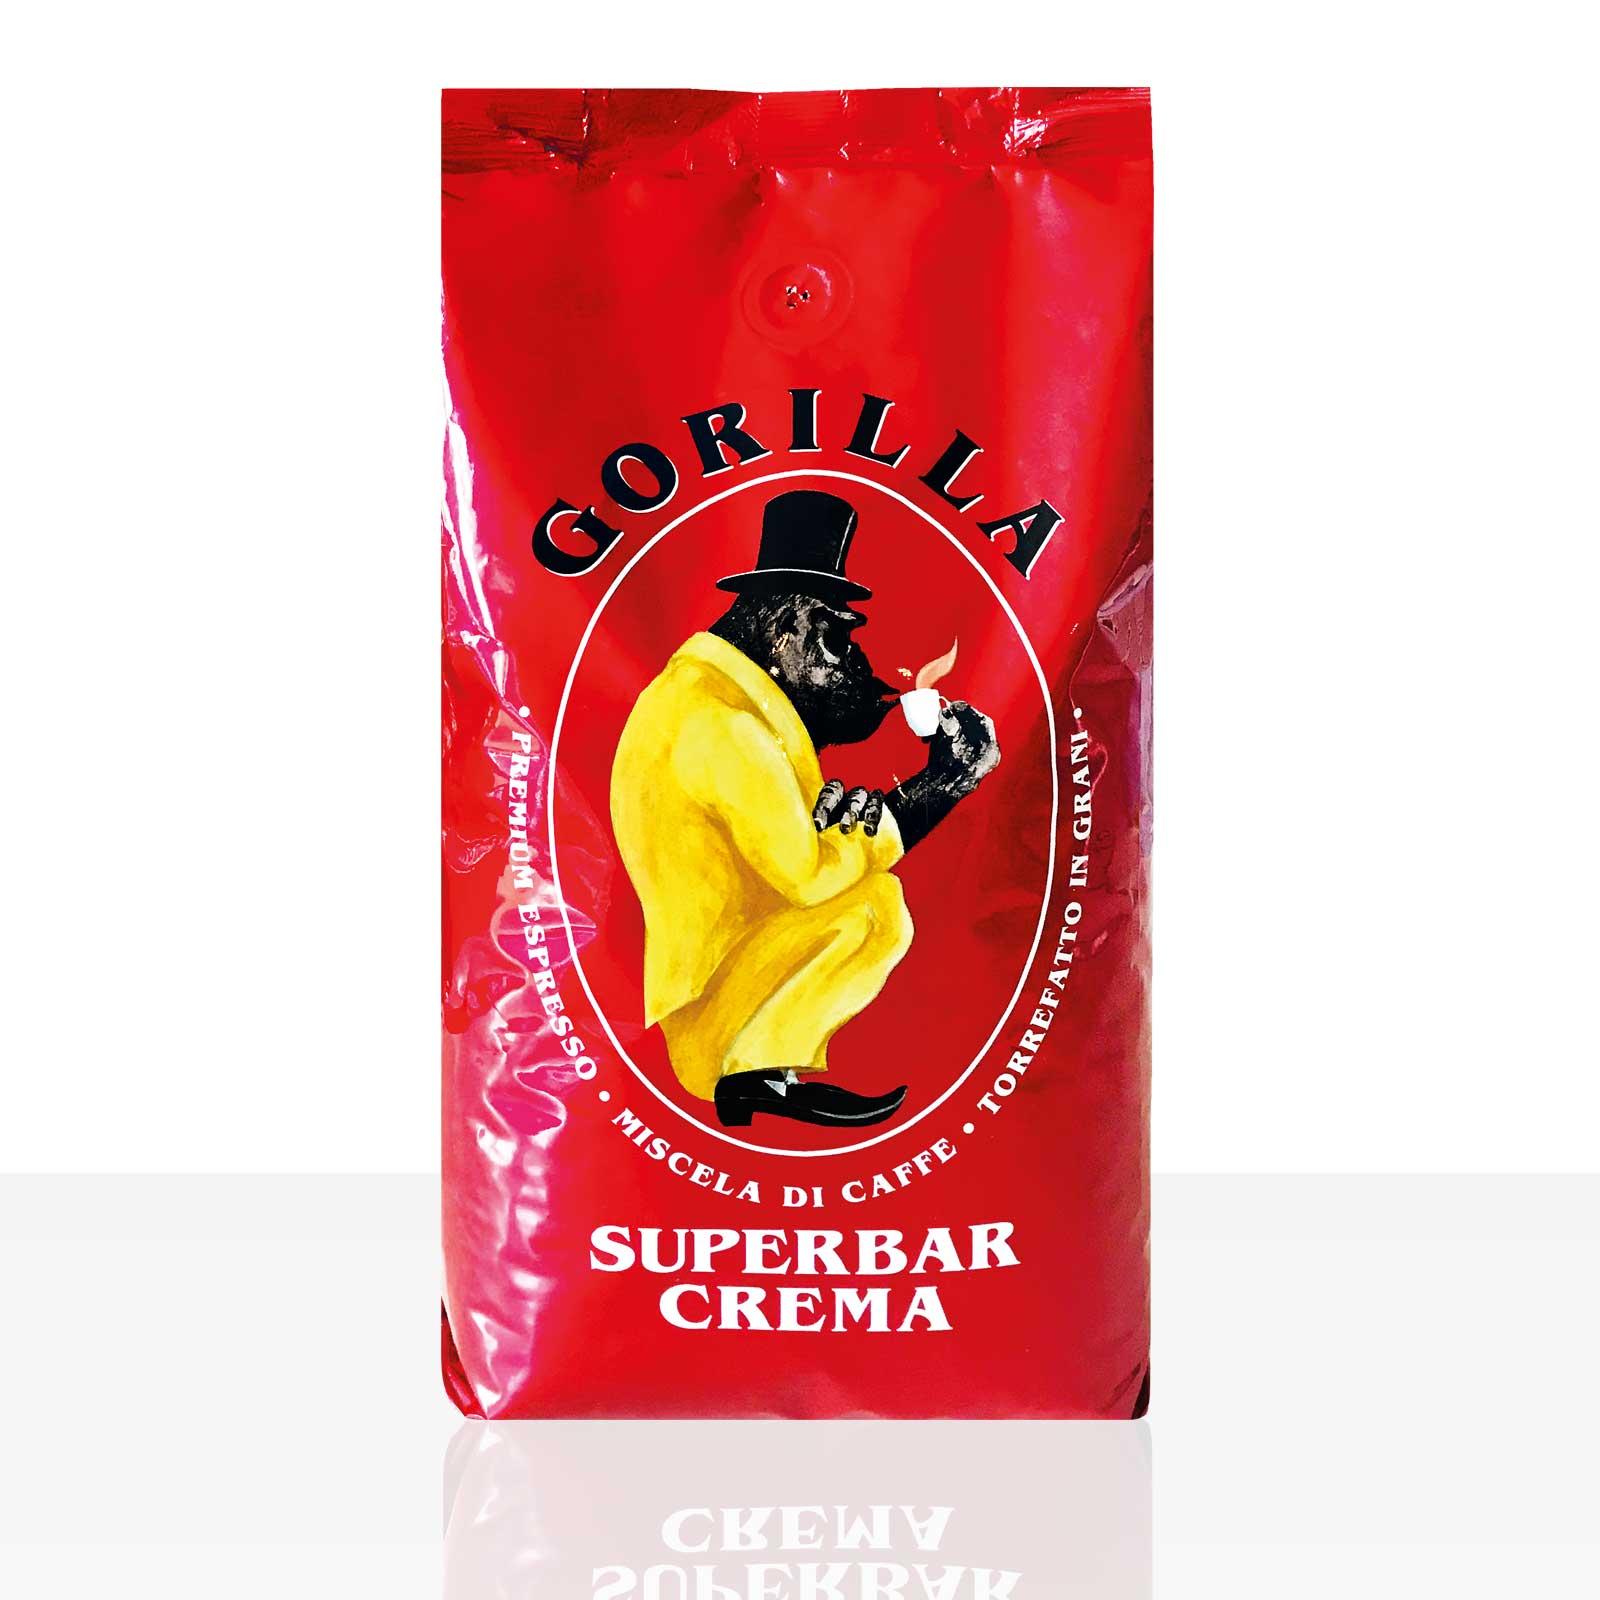 Gorilla Espresso Super Bar Crema 1kg, Kaffee ganze Bohne